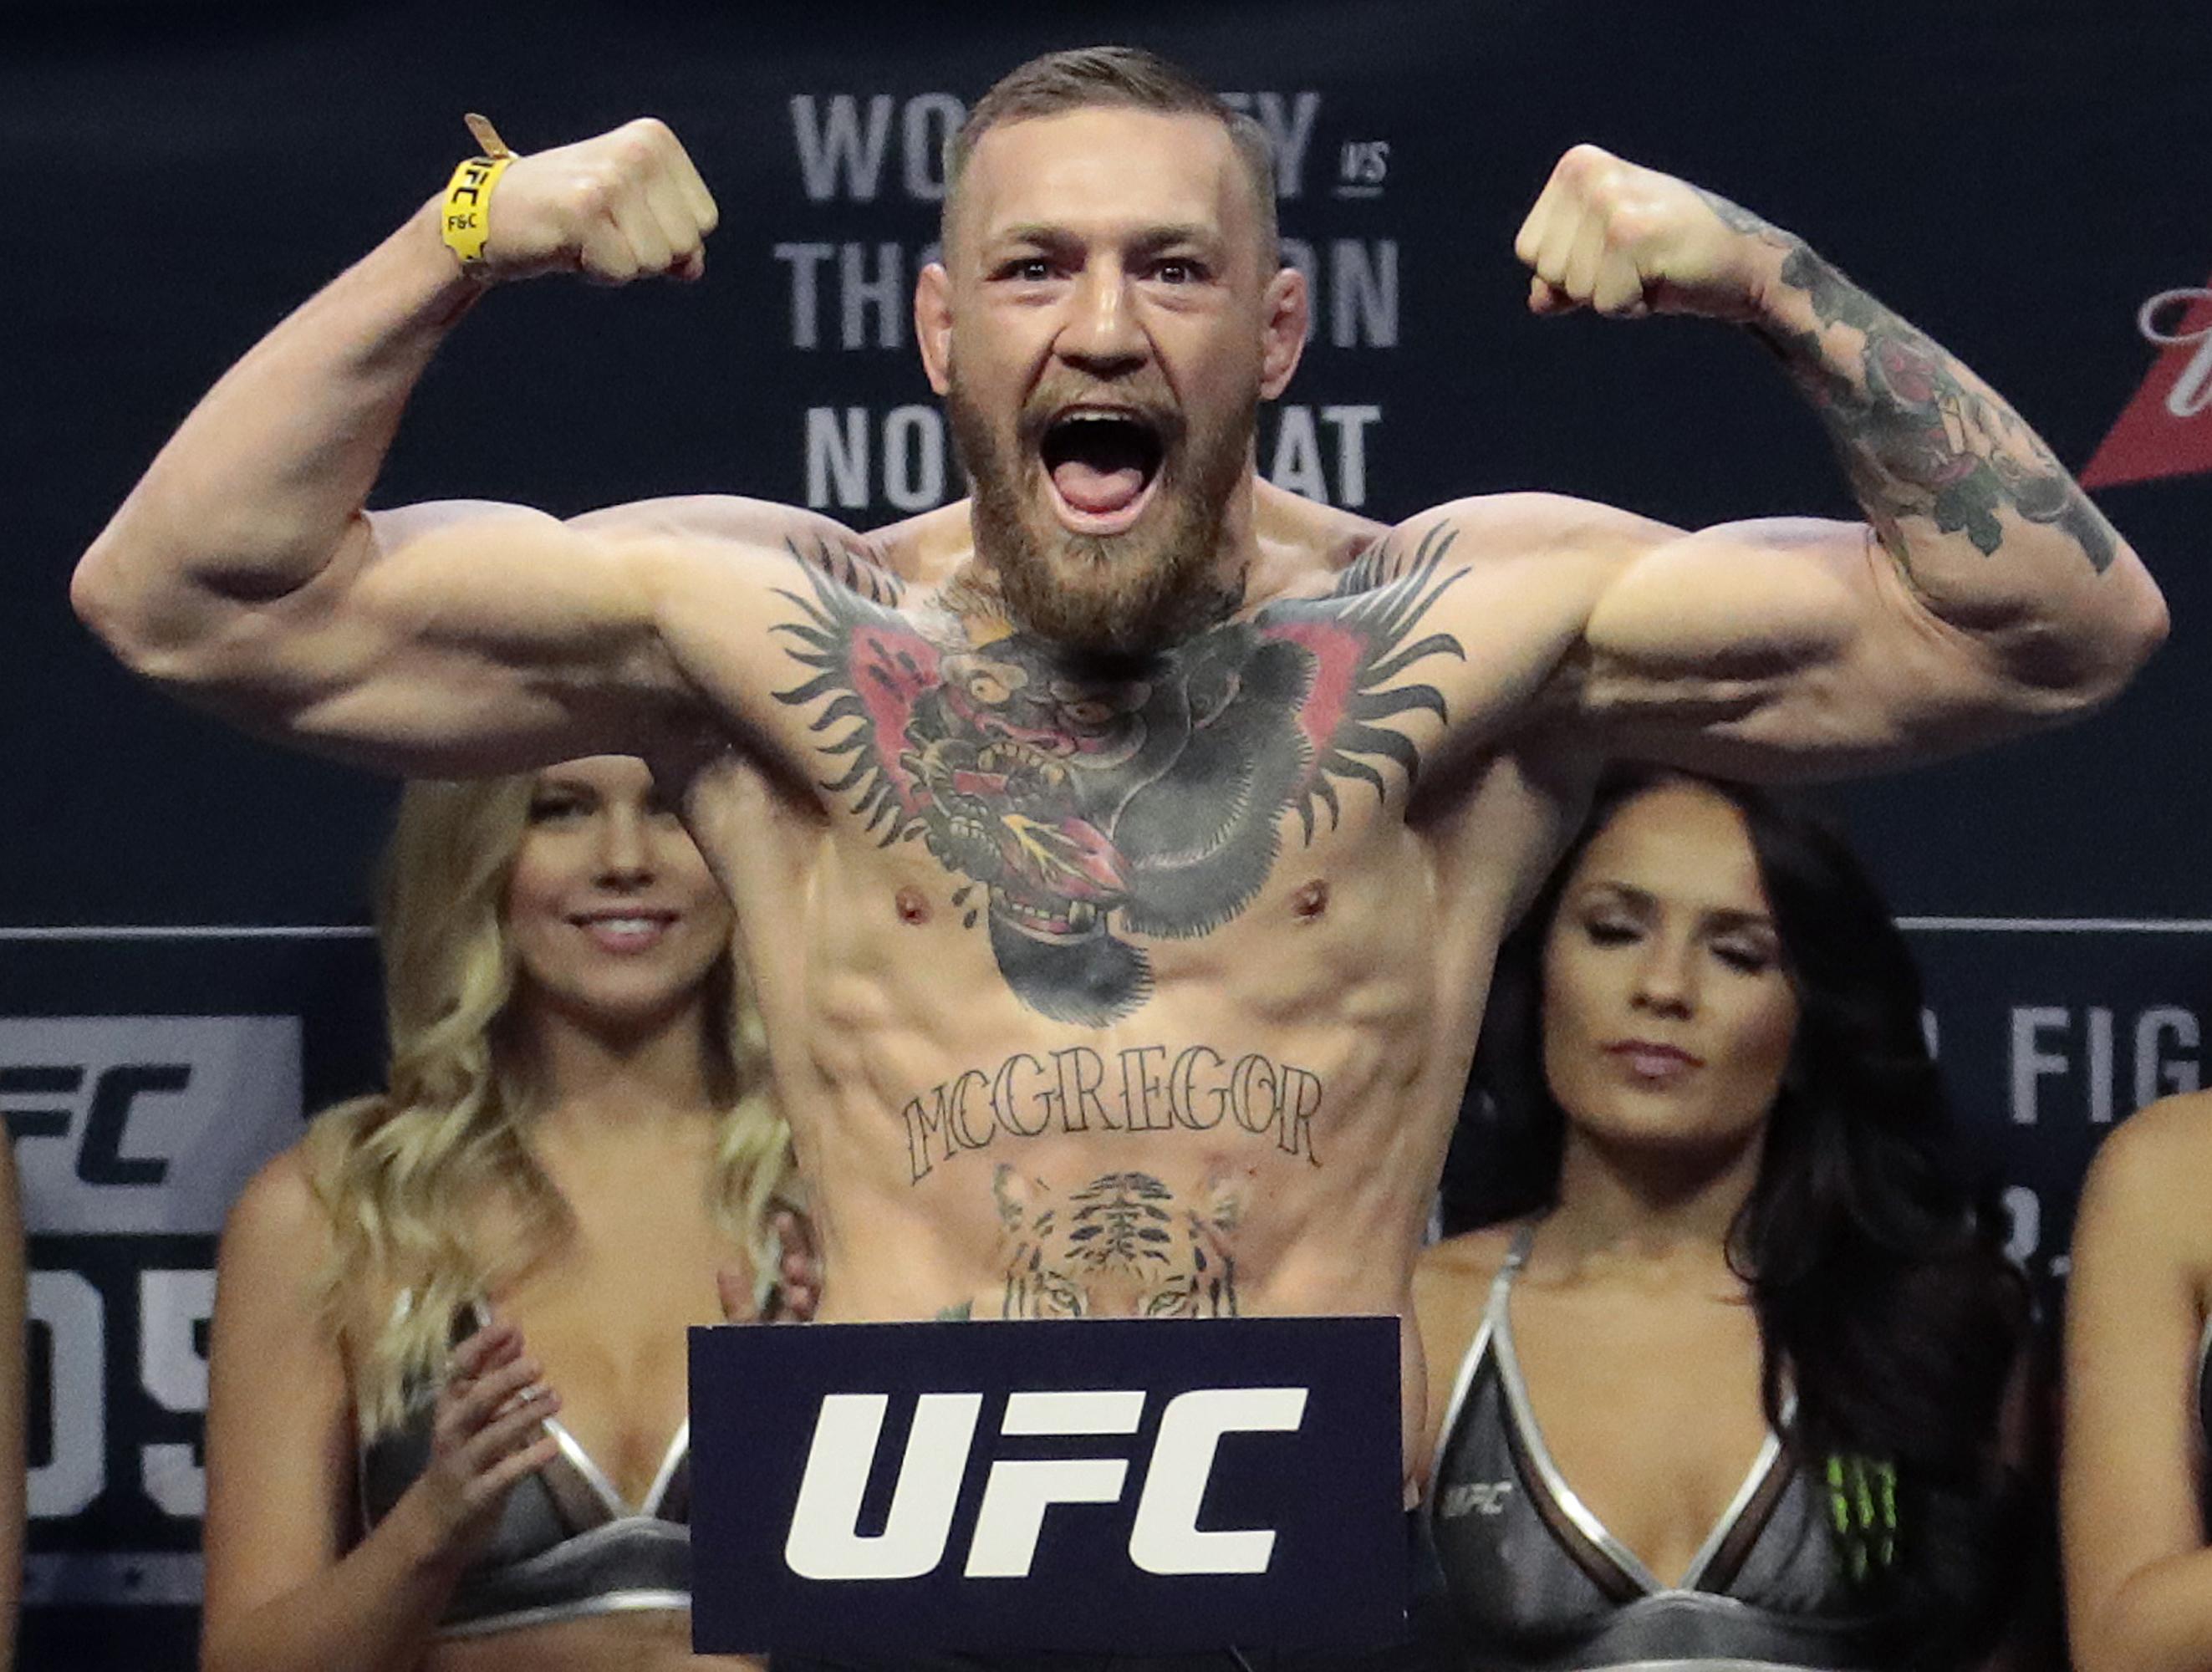 McGregor made the claim on social media